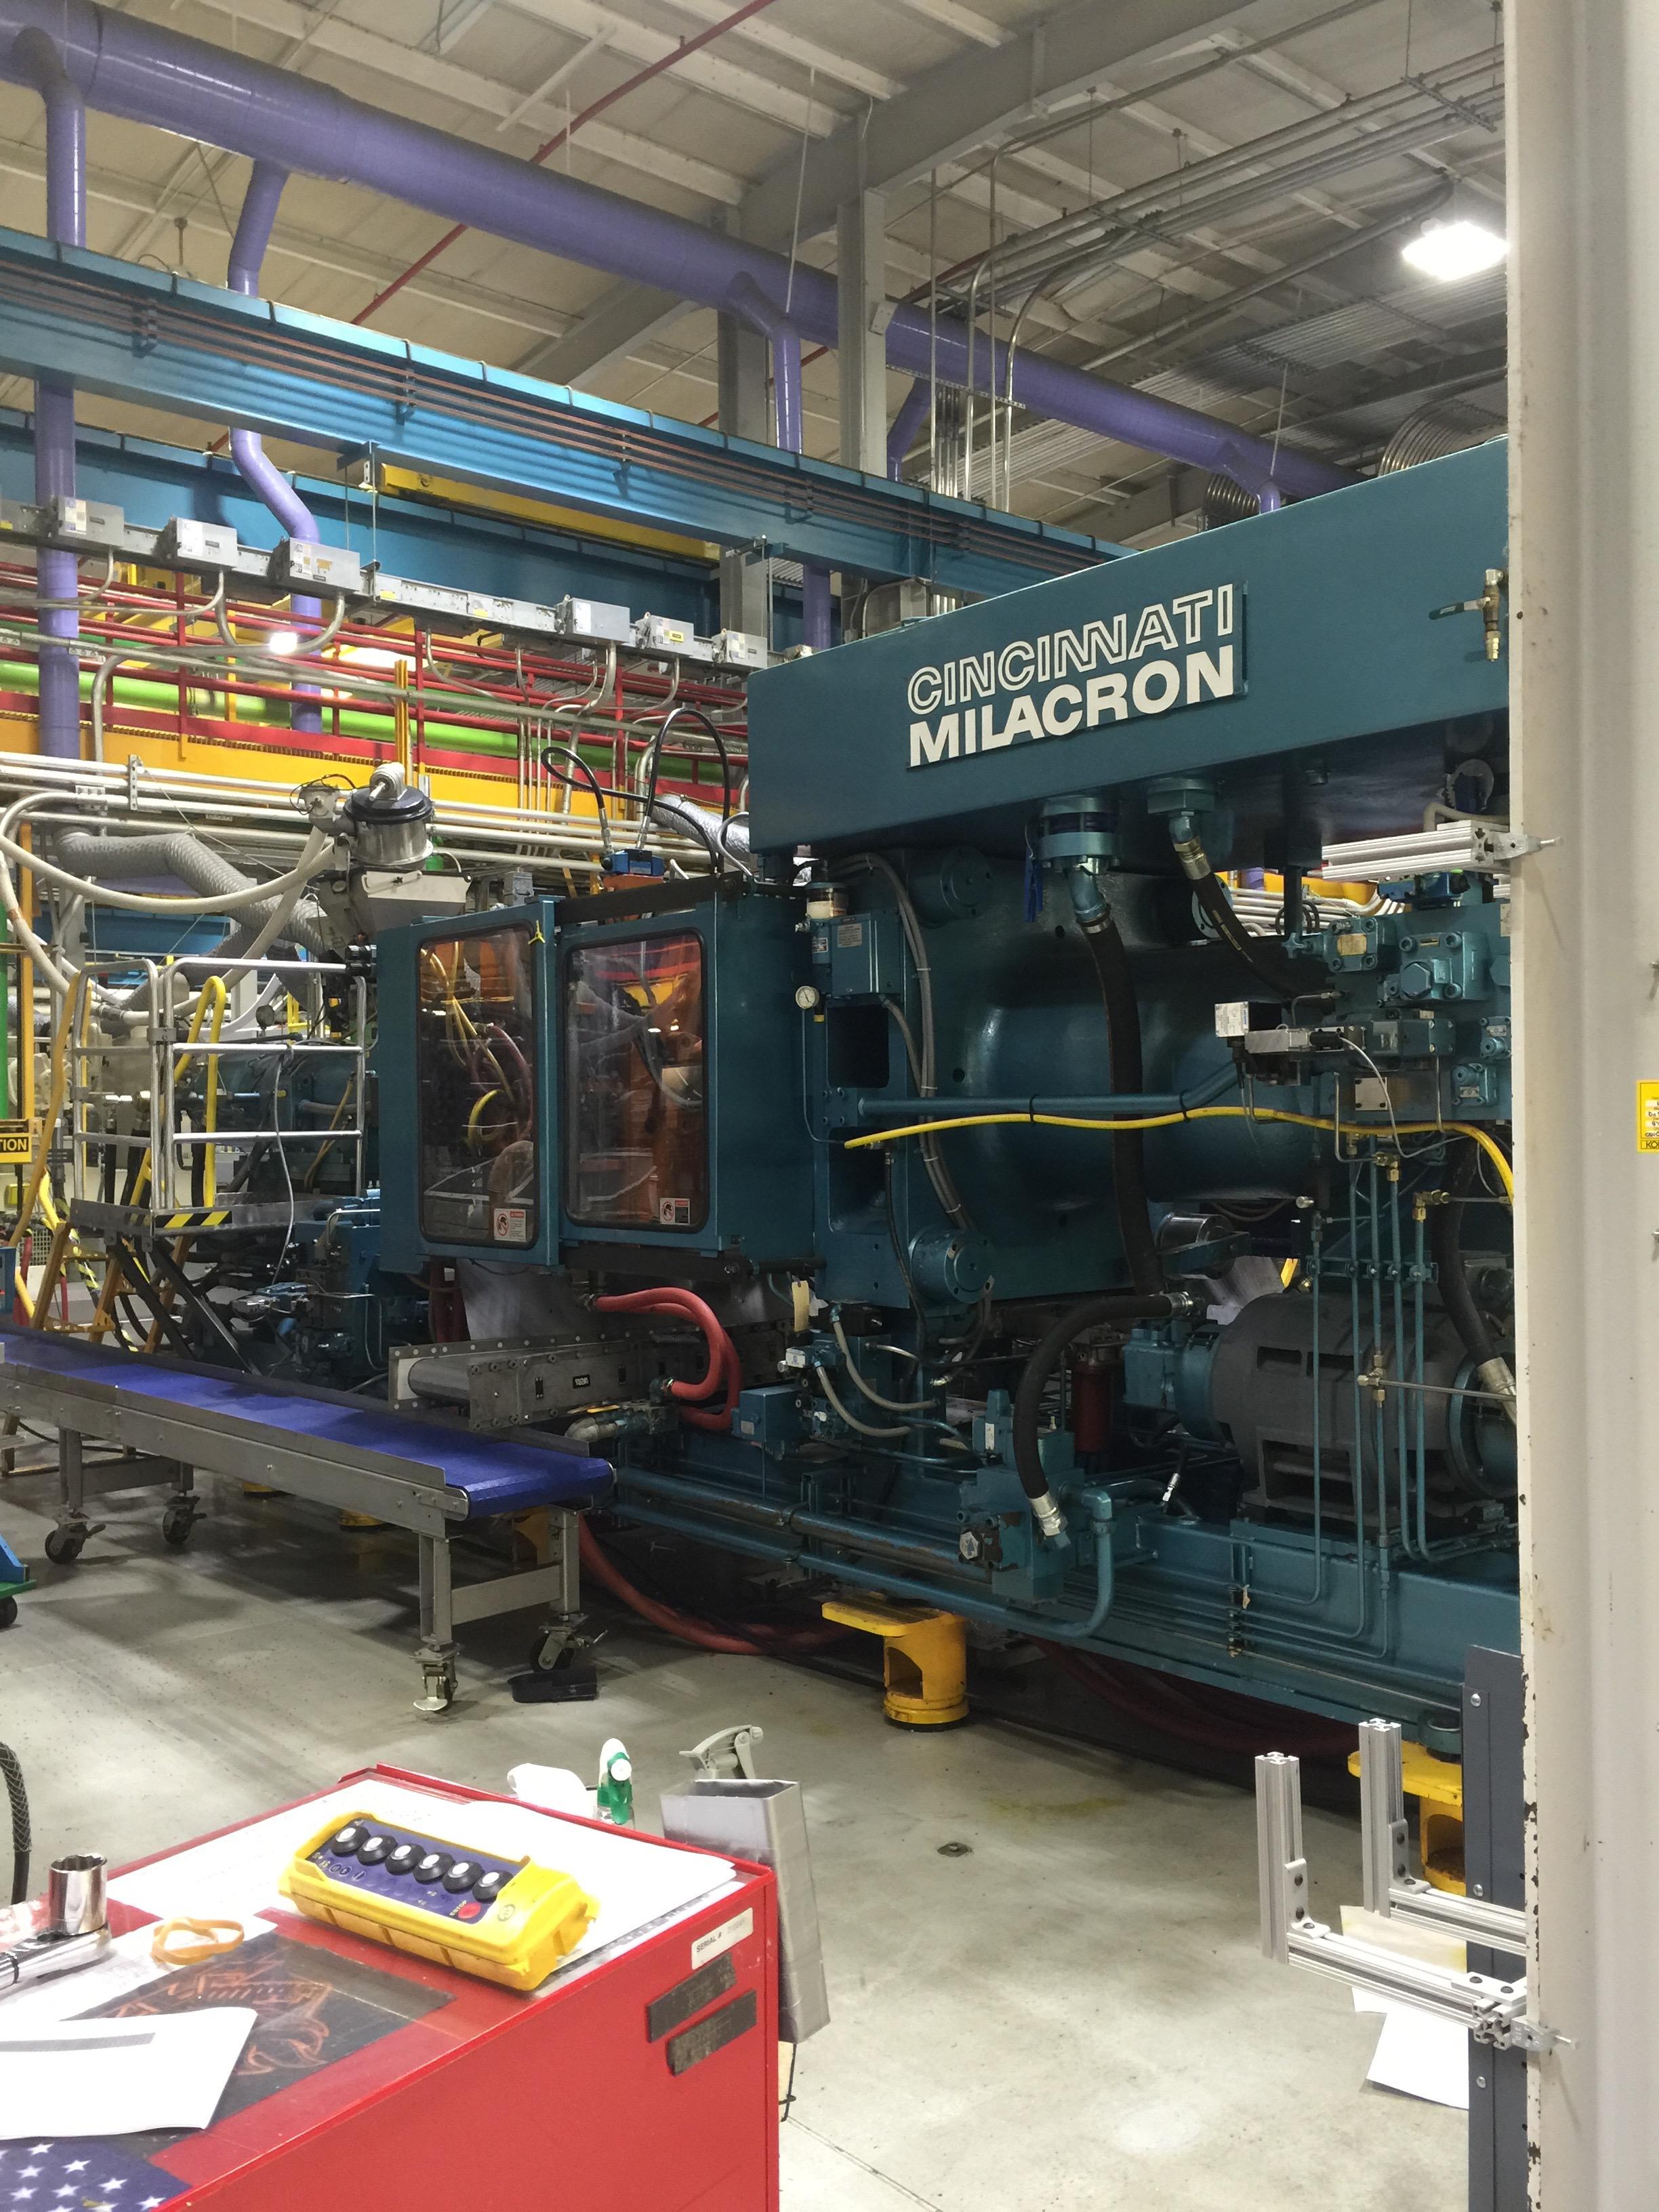 cincinnati milacron model 375 48 375 ton injection molding cincinnati milacron model 375 48 375 ton injection molding machine new controls